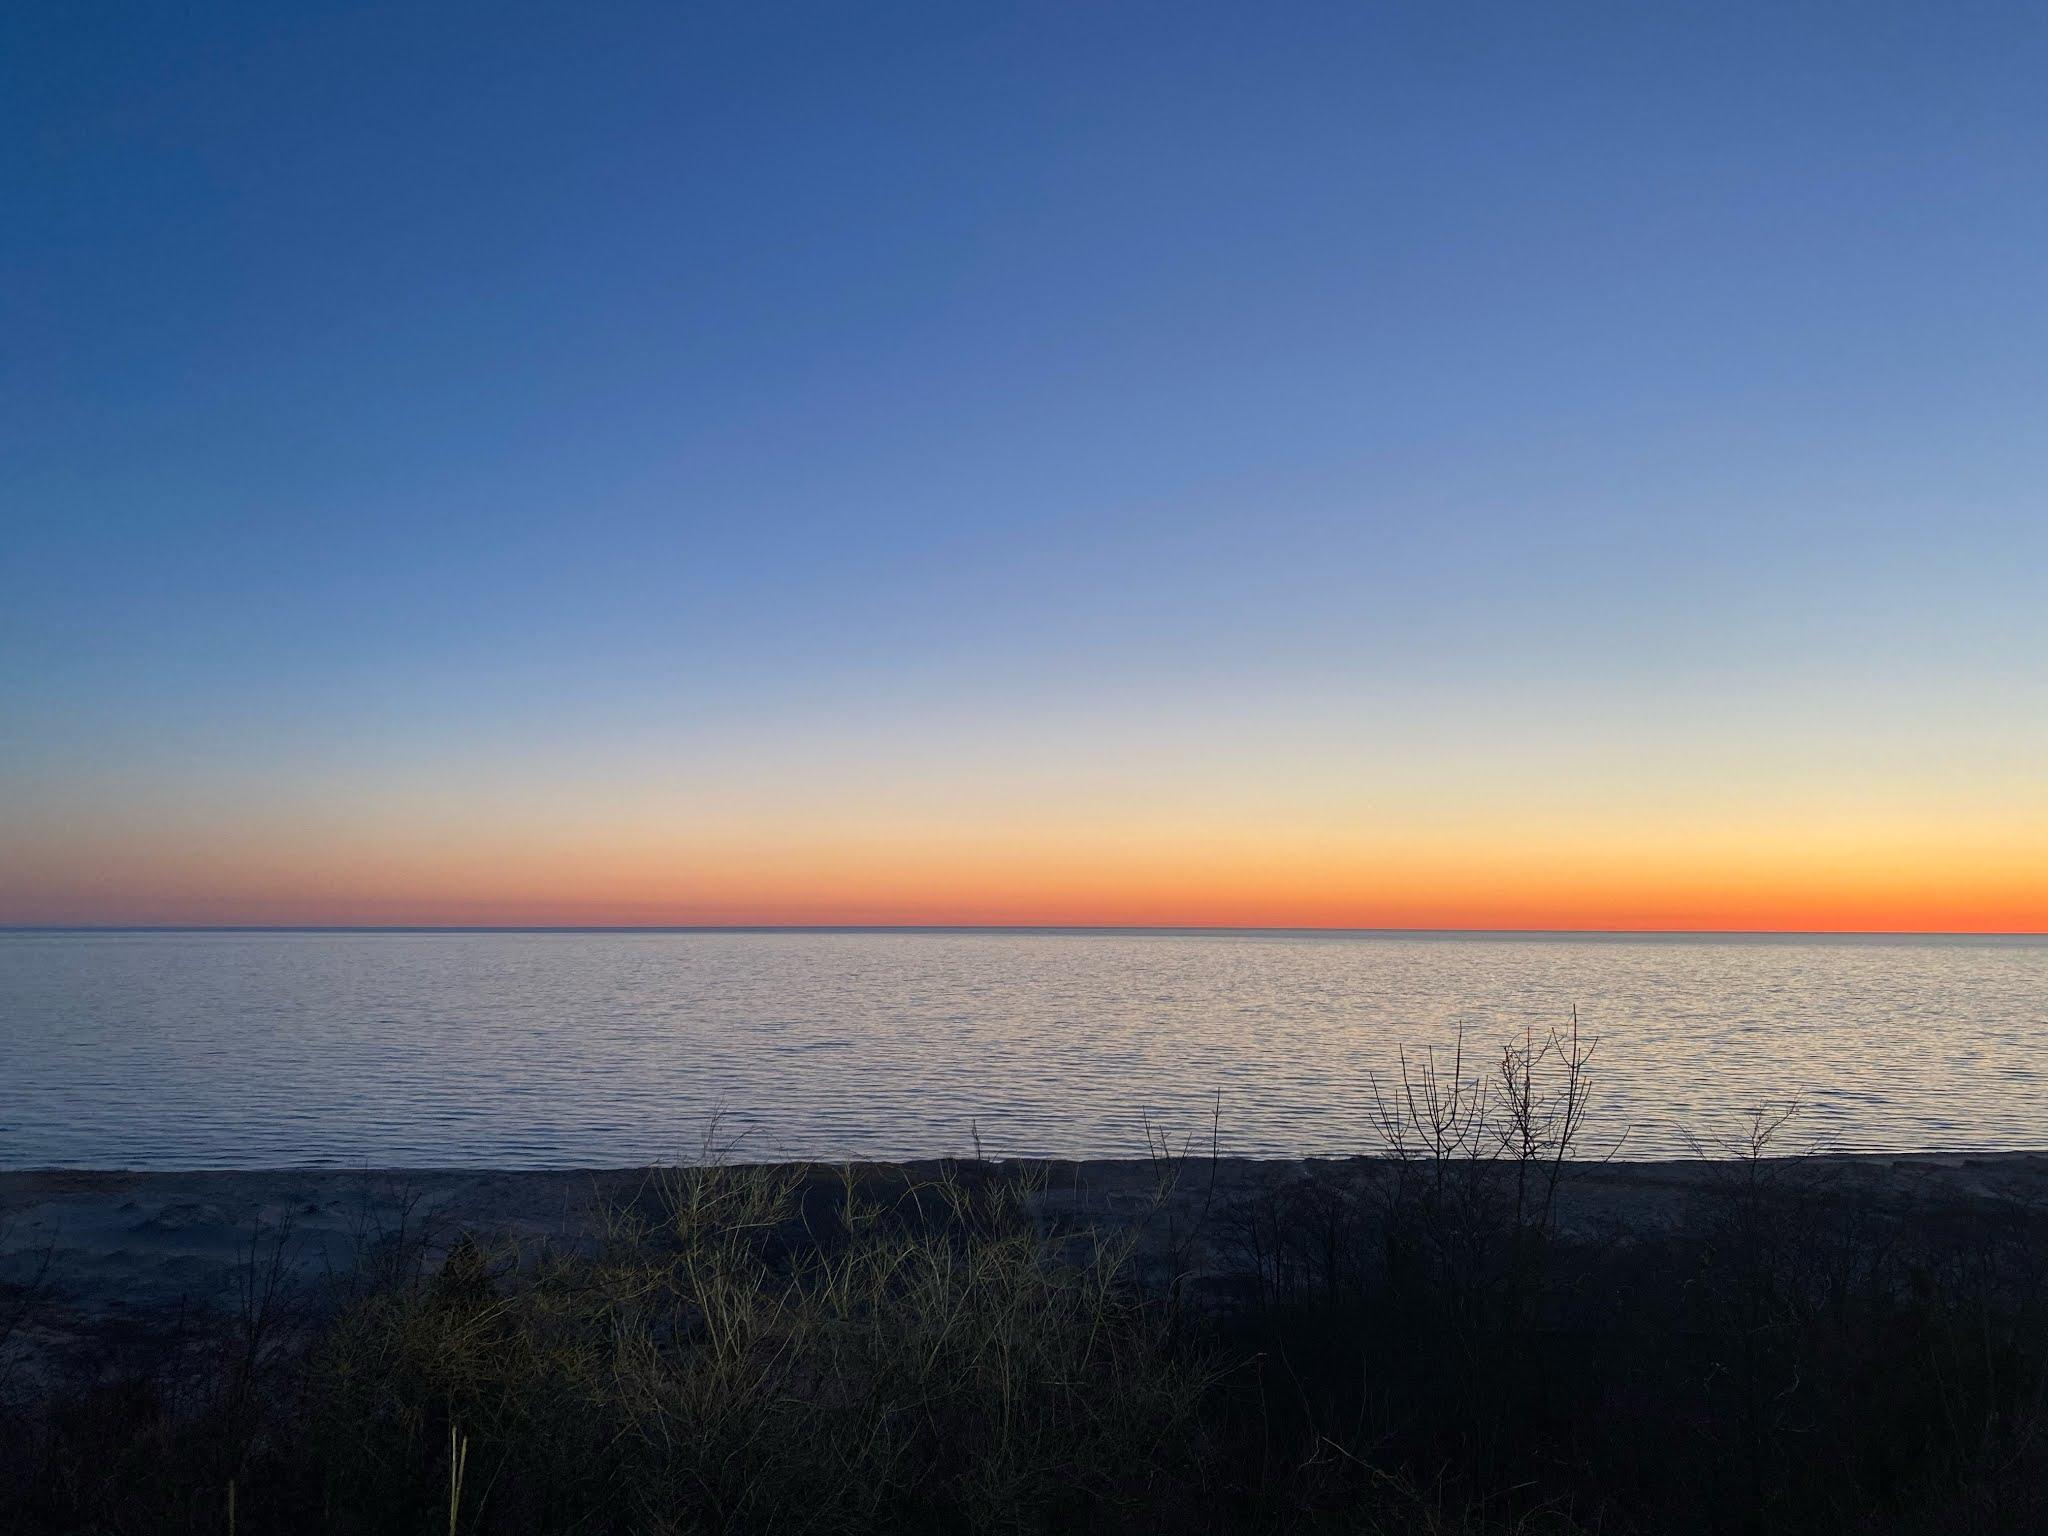 Sunset at Elberta Beach | www.biblio-style.com